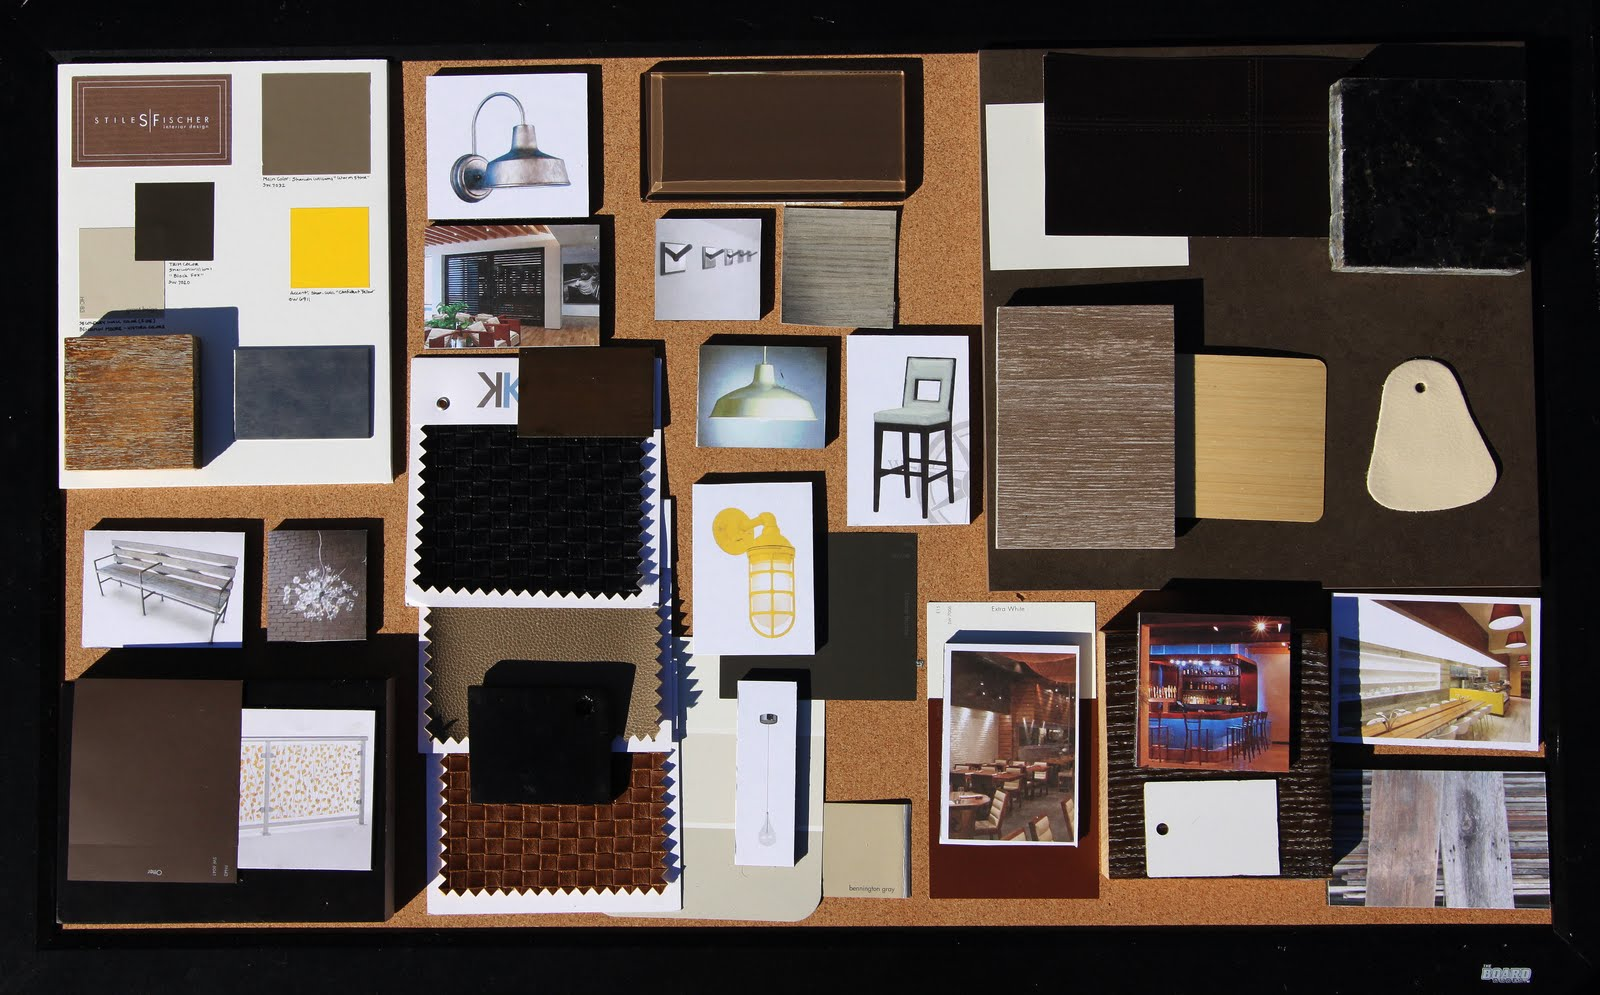 Stiles fischer interior design what i do presentation for Interior designs materials